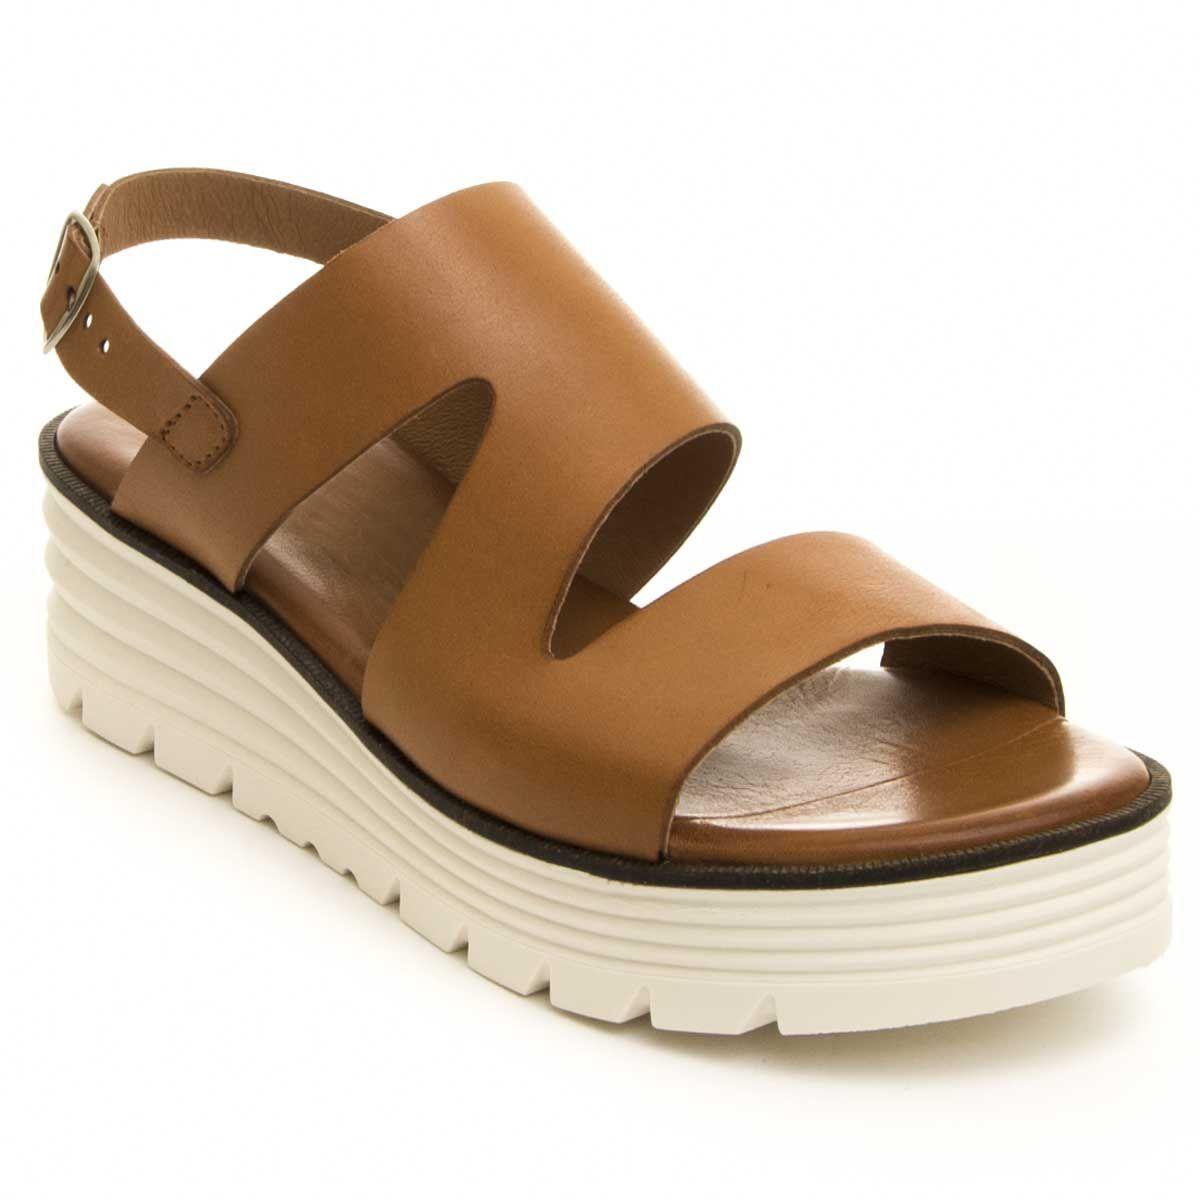 Purapiel Platform Sandal in Camel